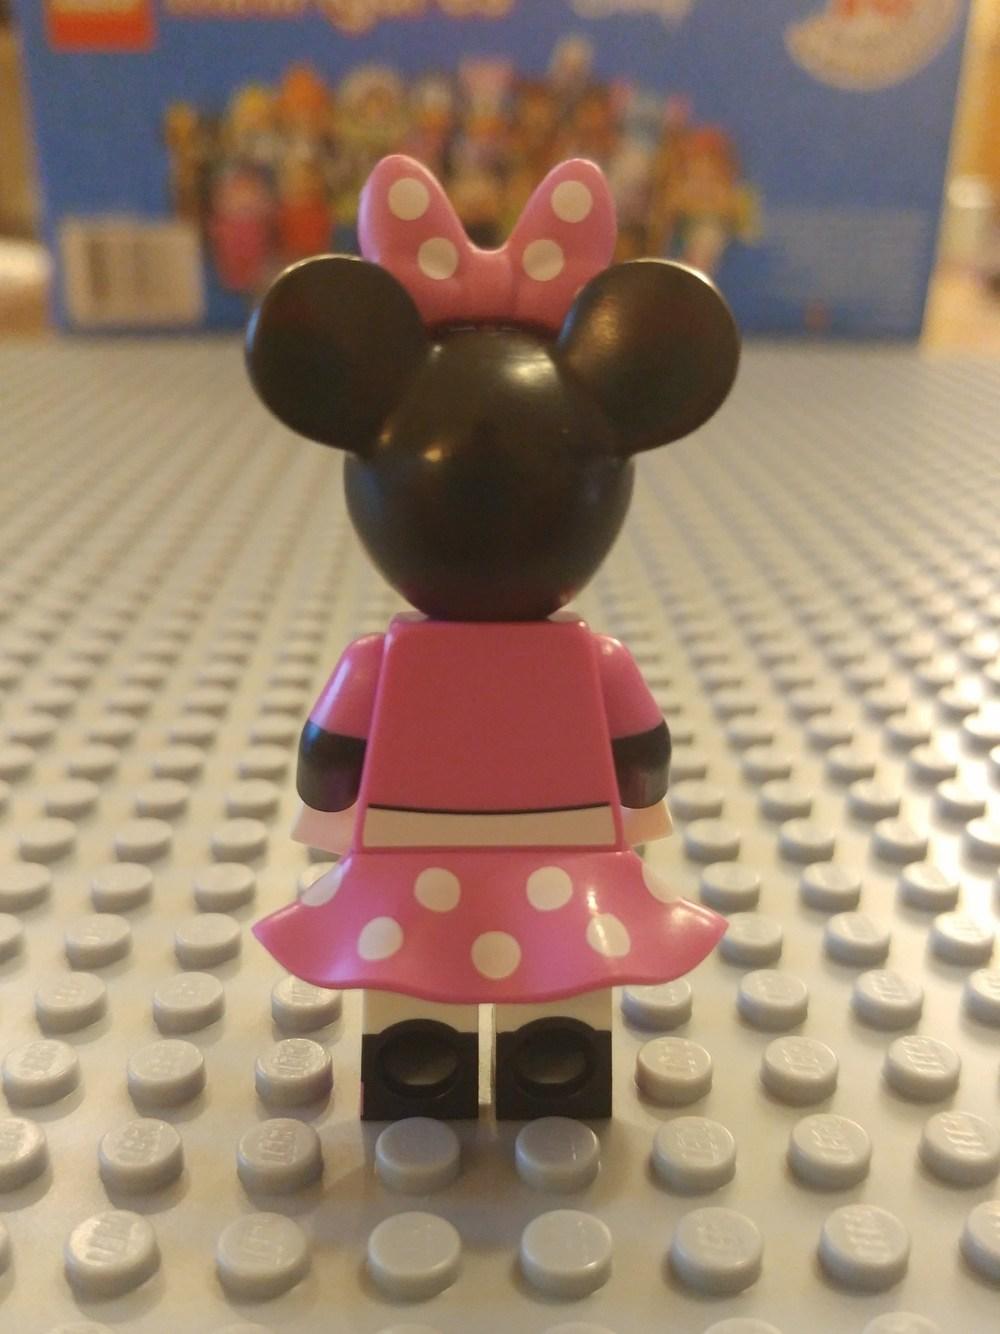 Mini Mouse Minifig Close Up - Back